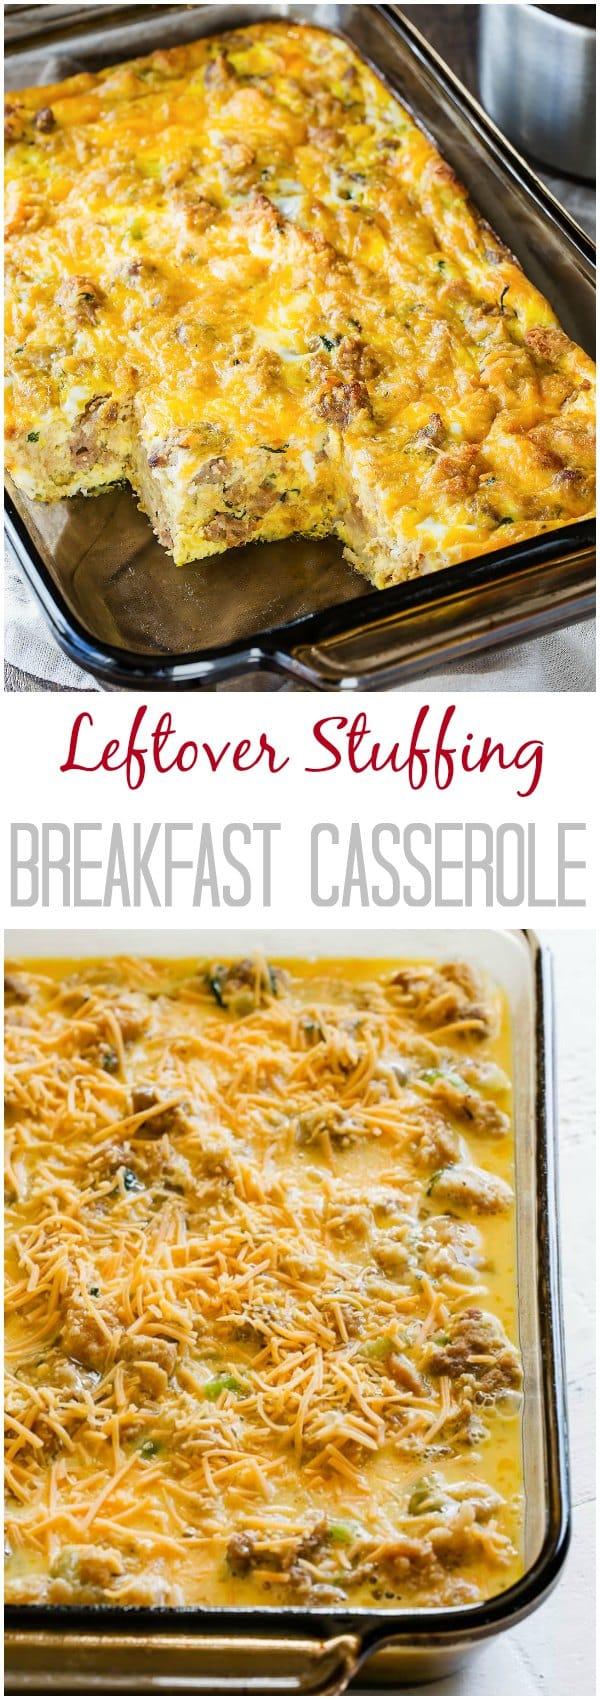 recipe: breakfast casserole with stuffing [1]